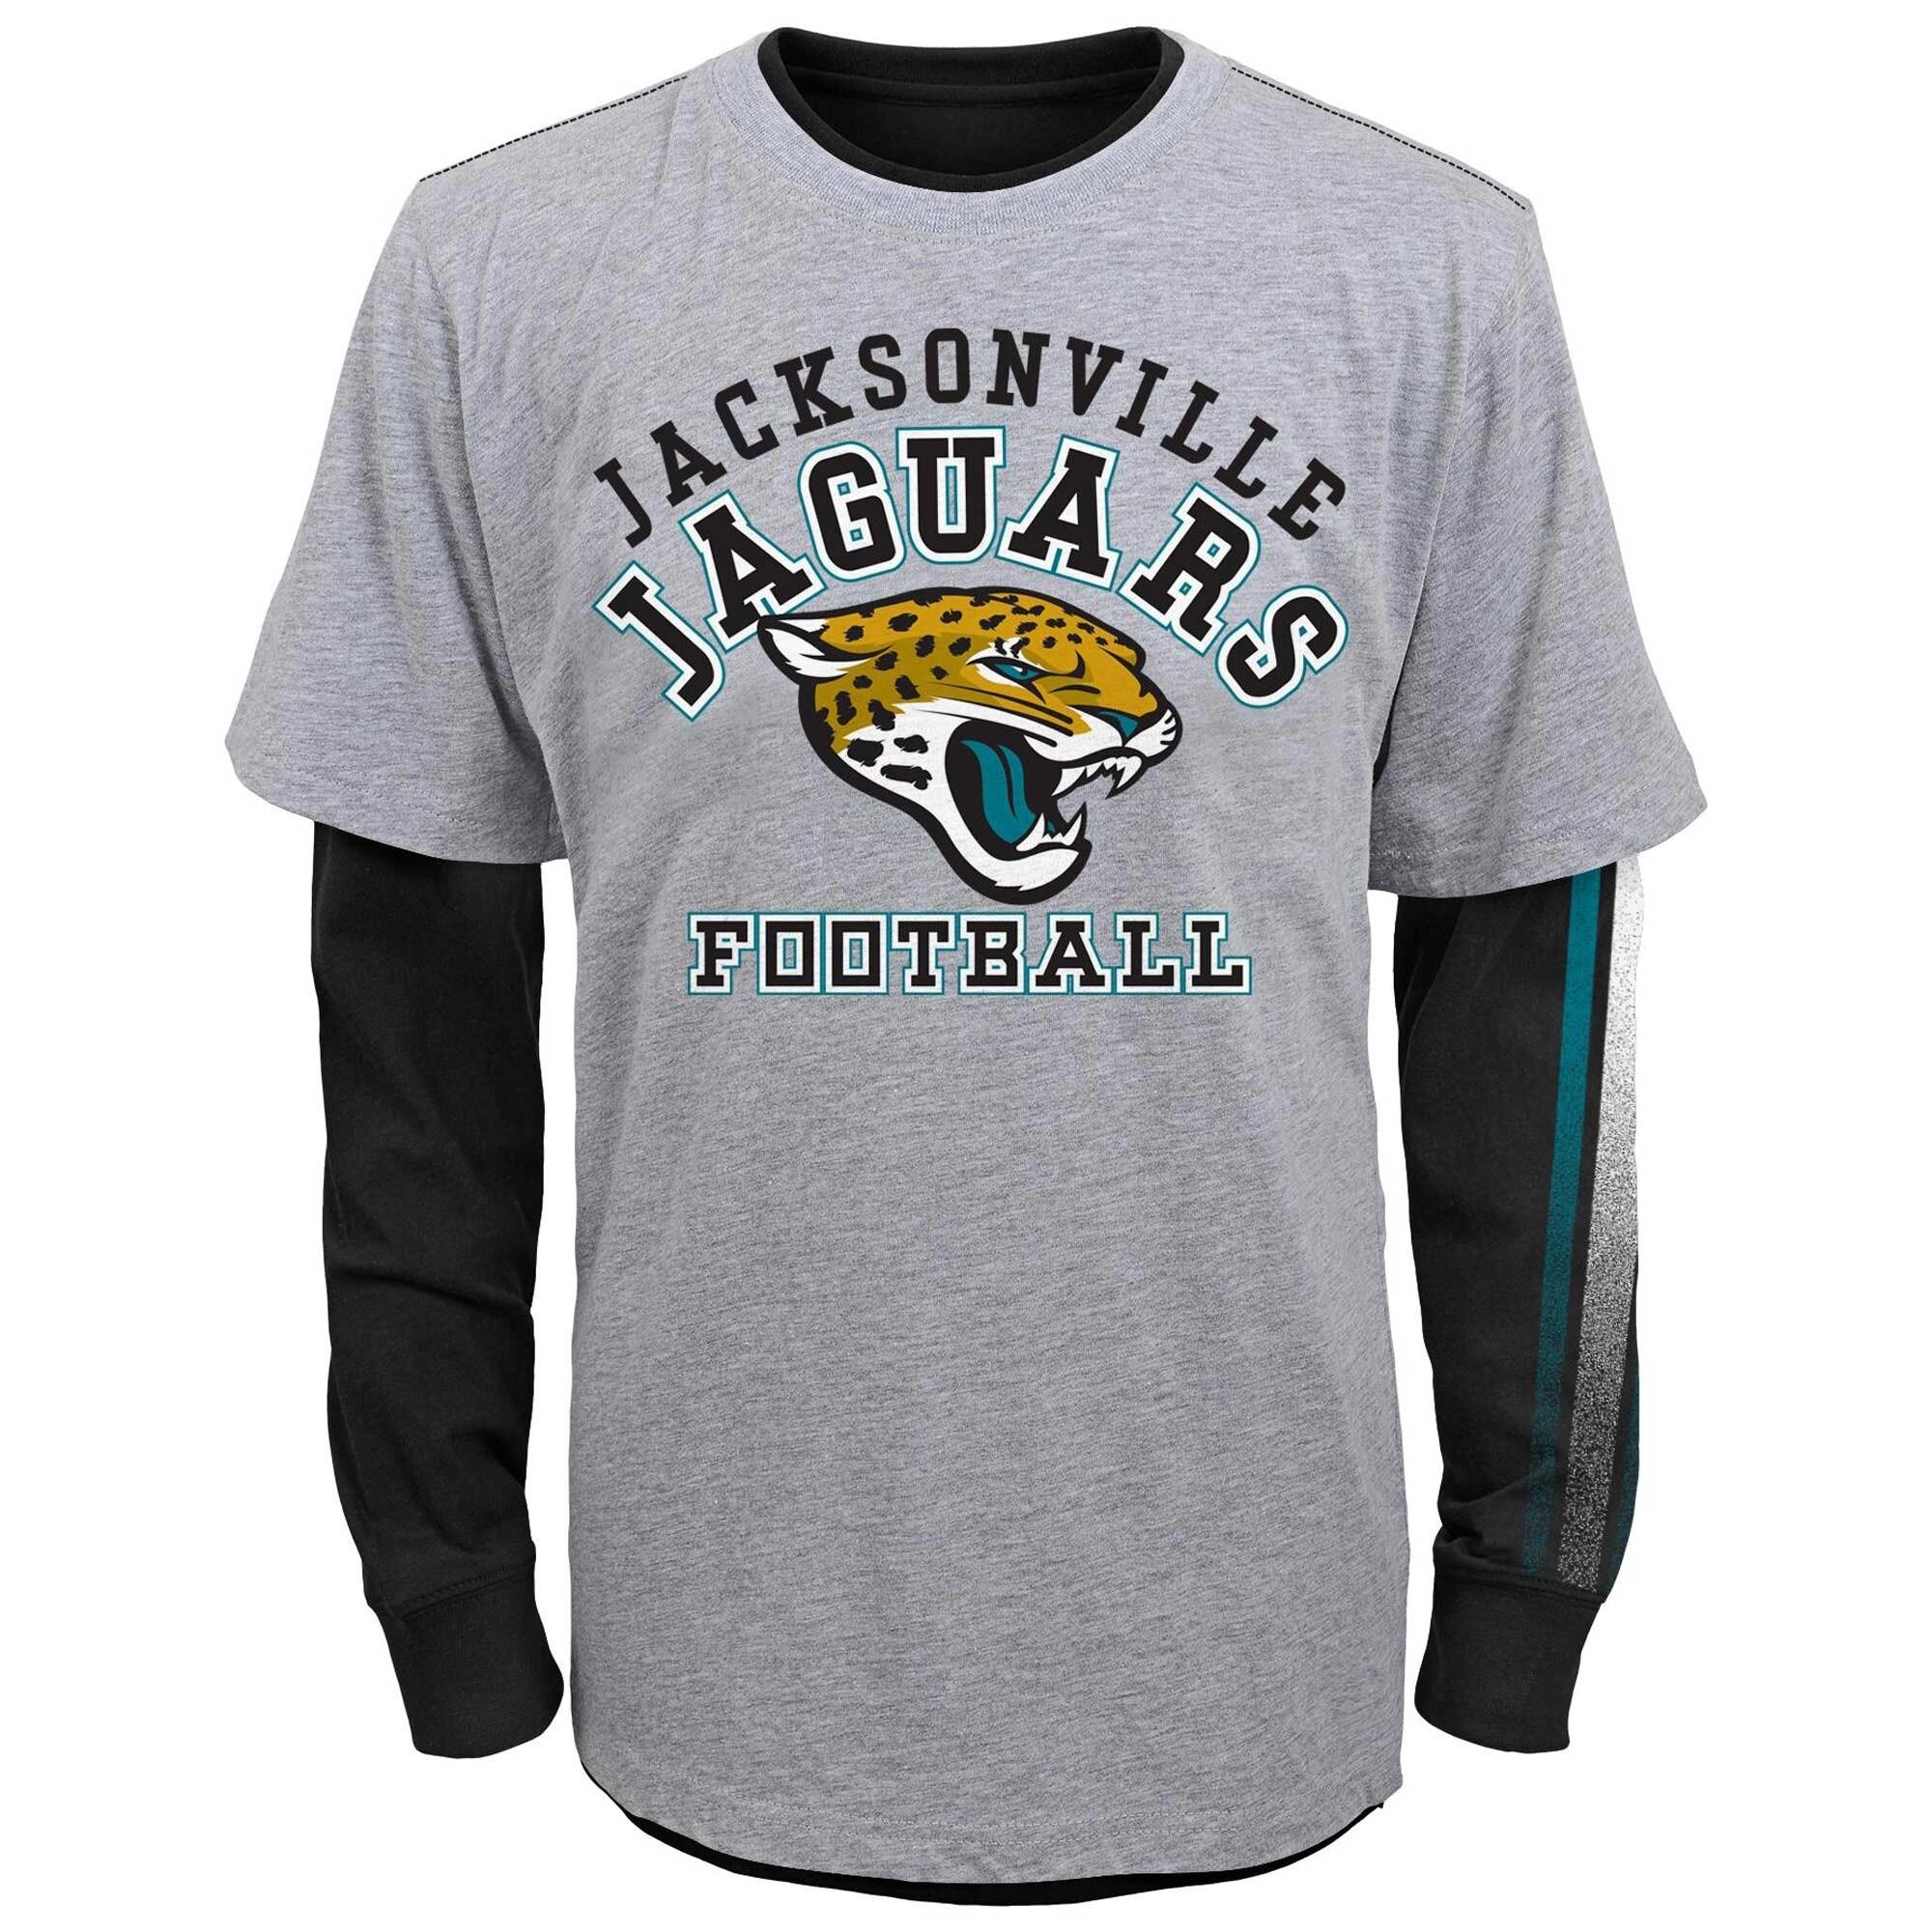 Jacksonville Jaguars Youth Classic Fade Short & Long Sleeve T-Shirt Combo Pack - Gray